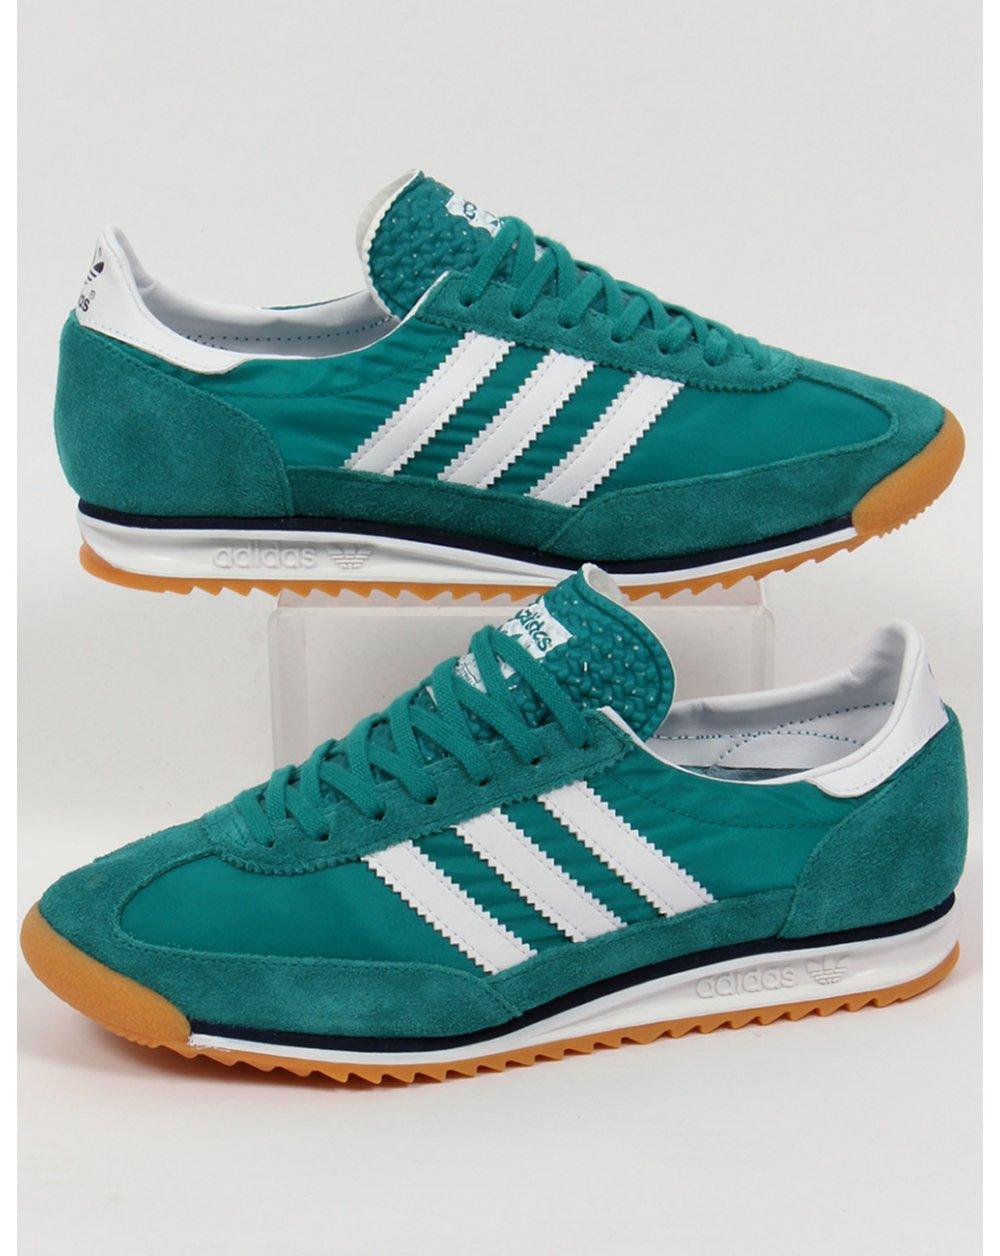 pretty nice 39585 79d3f Adidas Sl 72 Trainers Eqt Green/white